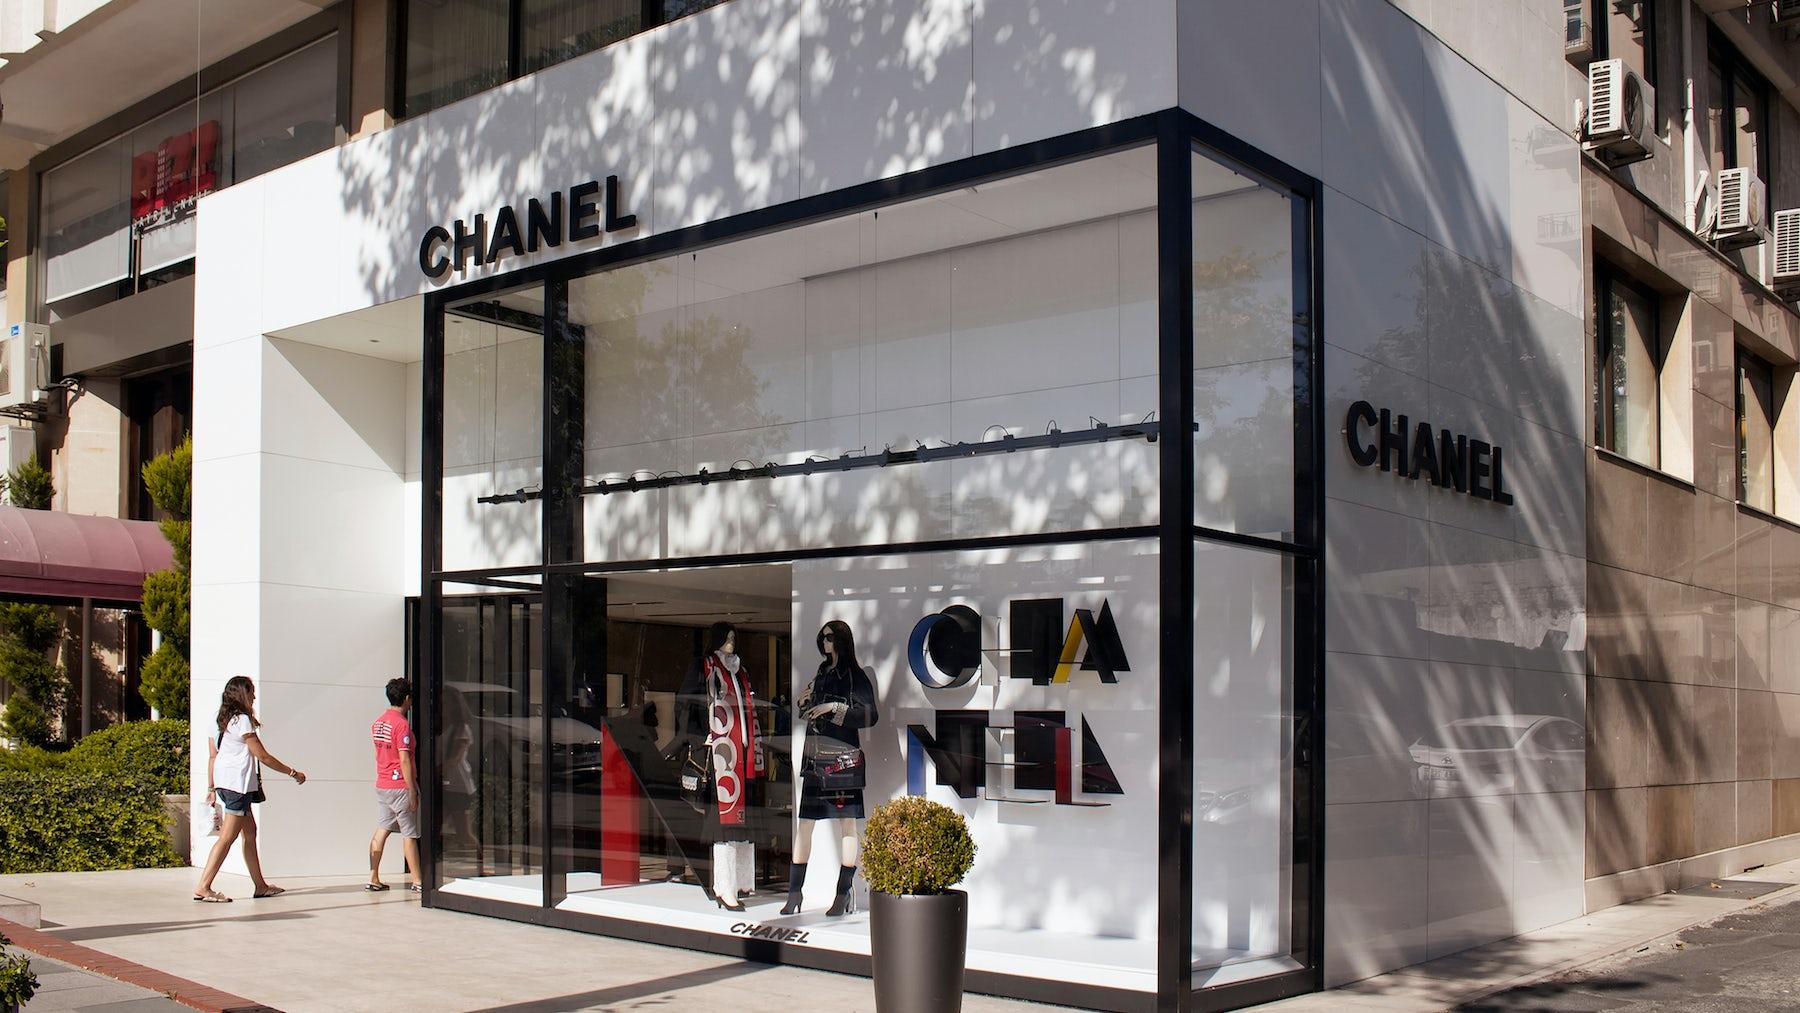 Chanel store | Source: Shutterstock